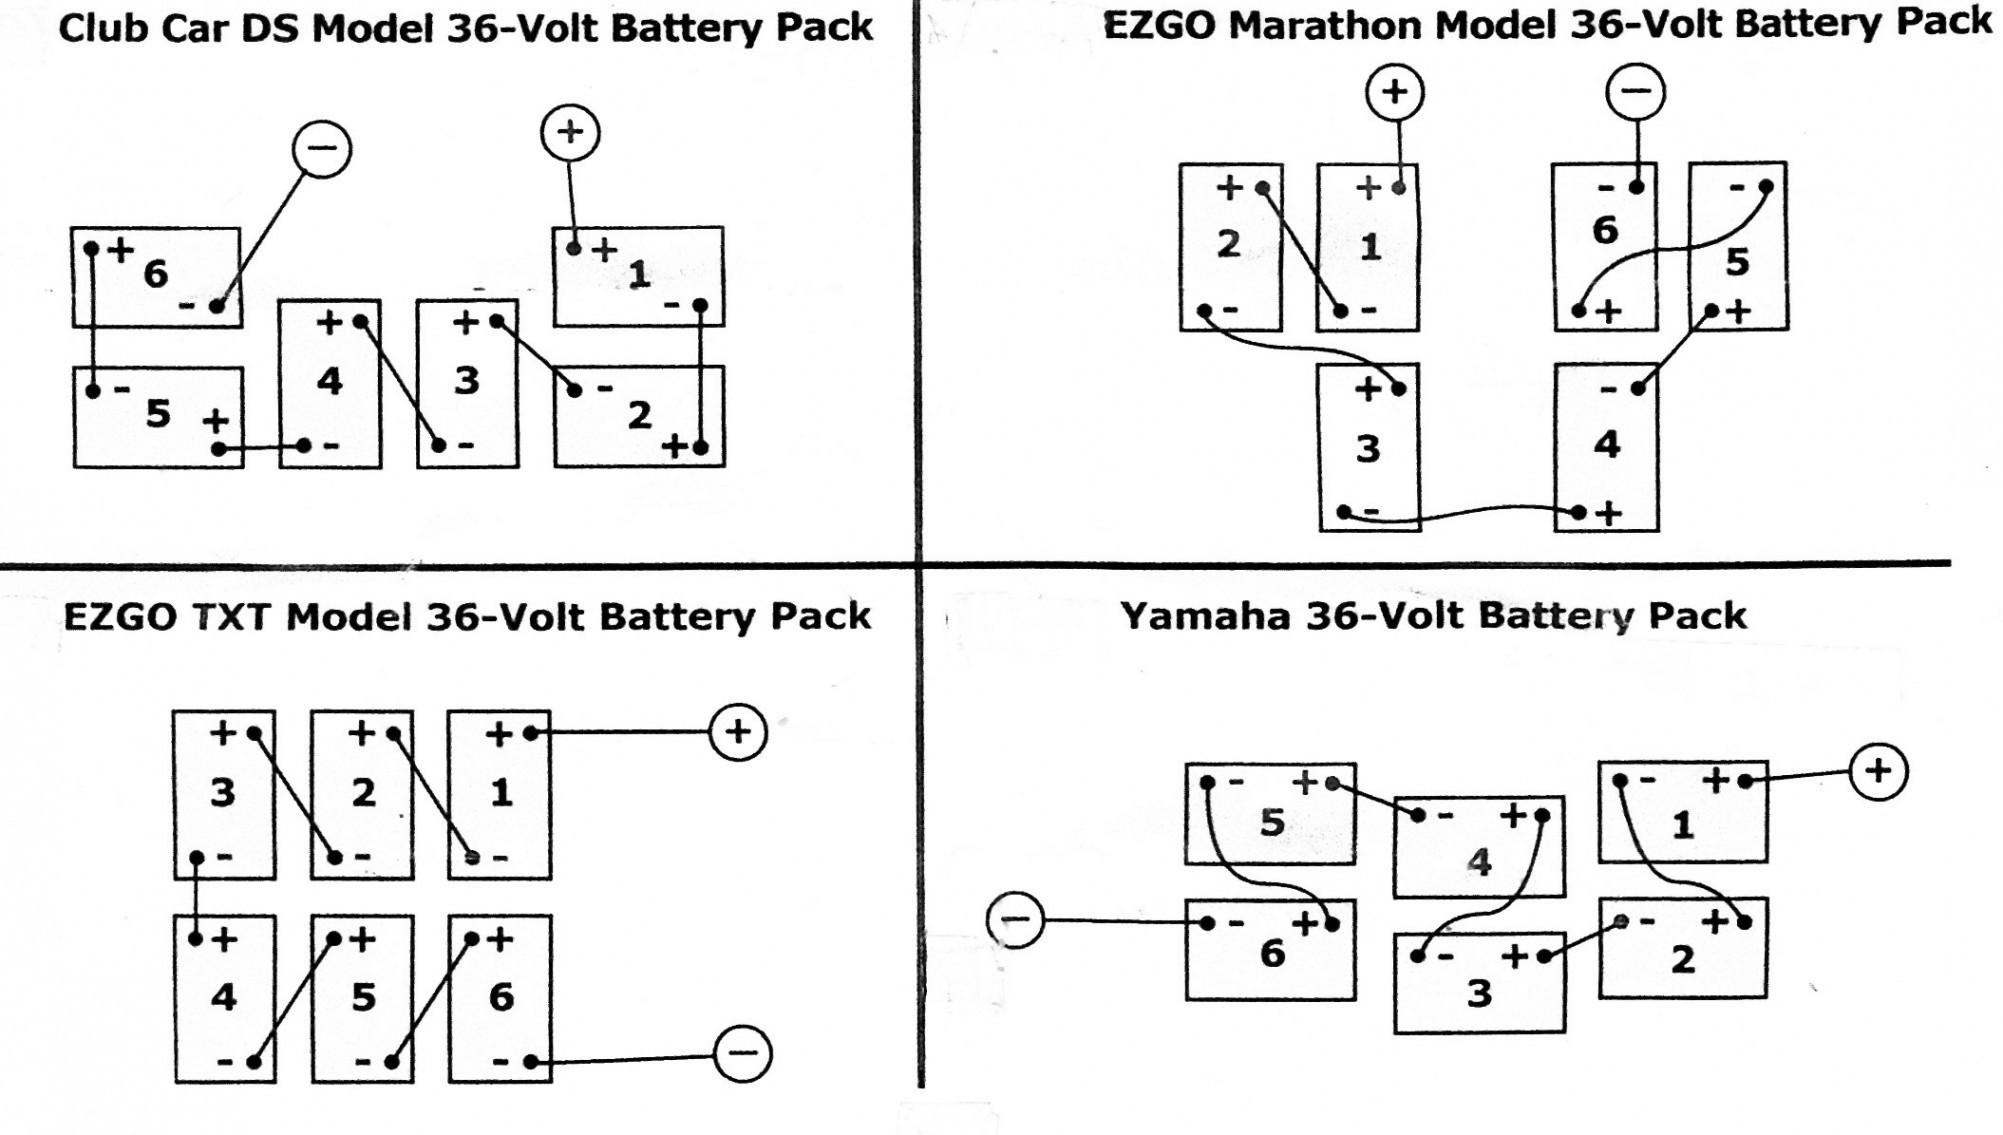 Car Chassis Diagram Ez Go Golf Cart Battery Wiring Diagram New Ez Go Wiring Diagram 36 Of Car Chassis Diagram